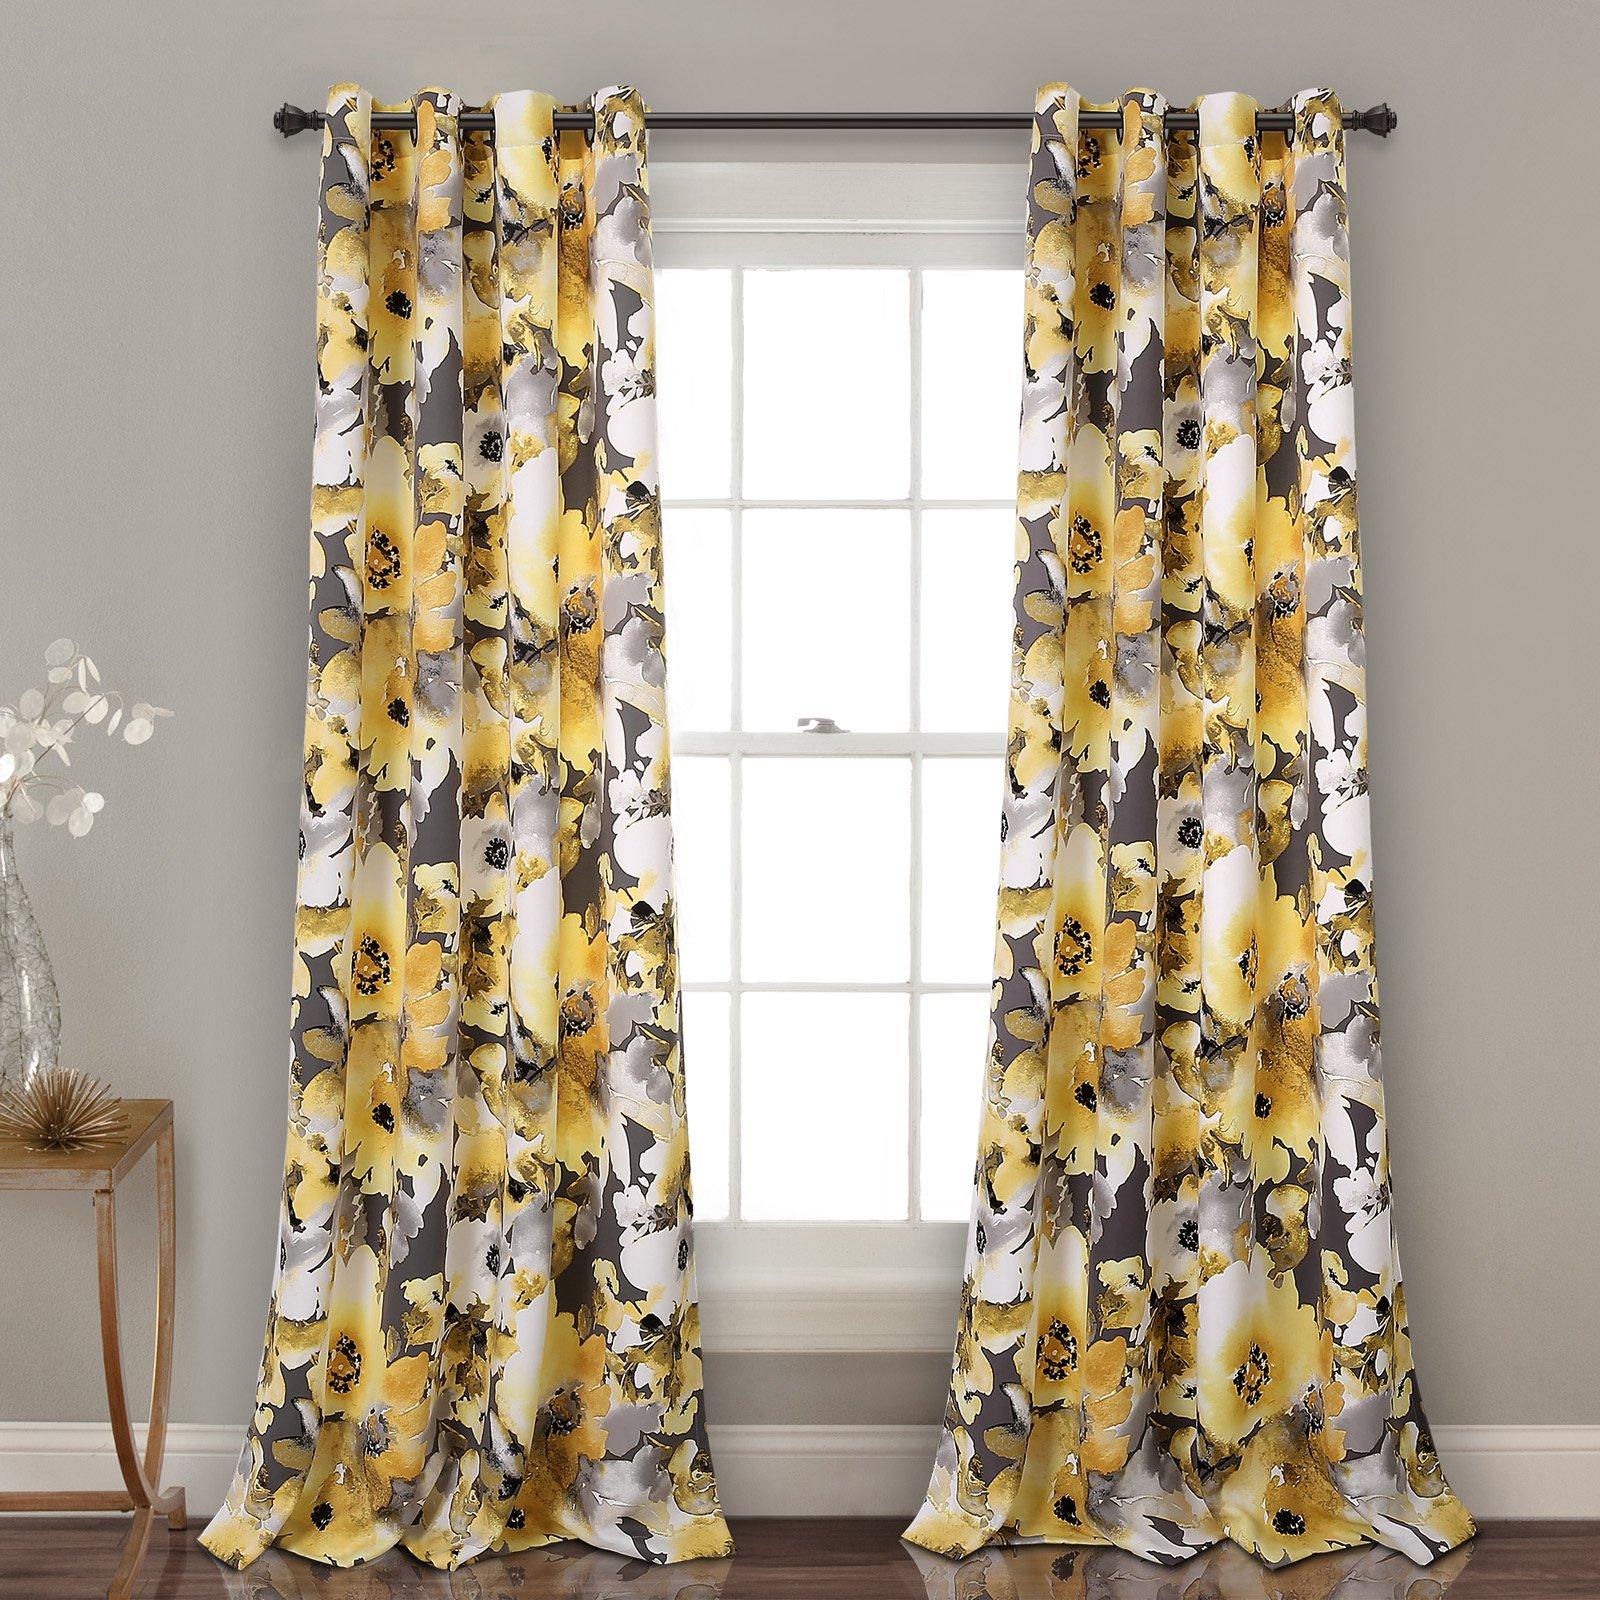 Floral Watercolor Room Darkening Window Curtain Panels Yellow/Gray Set 52x84